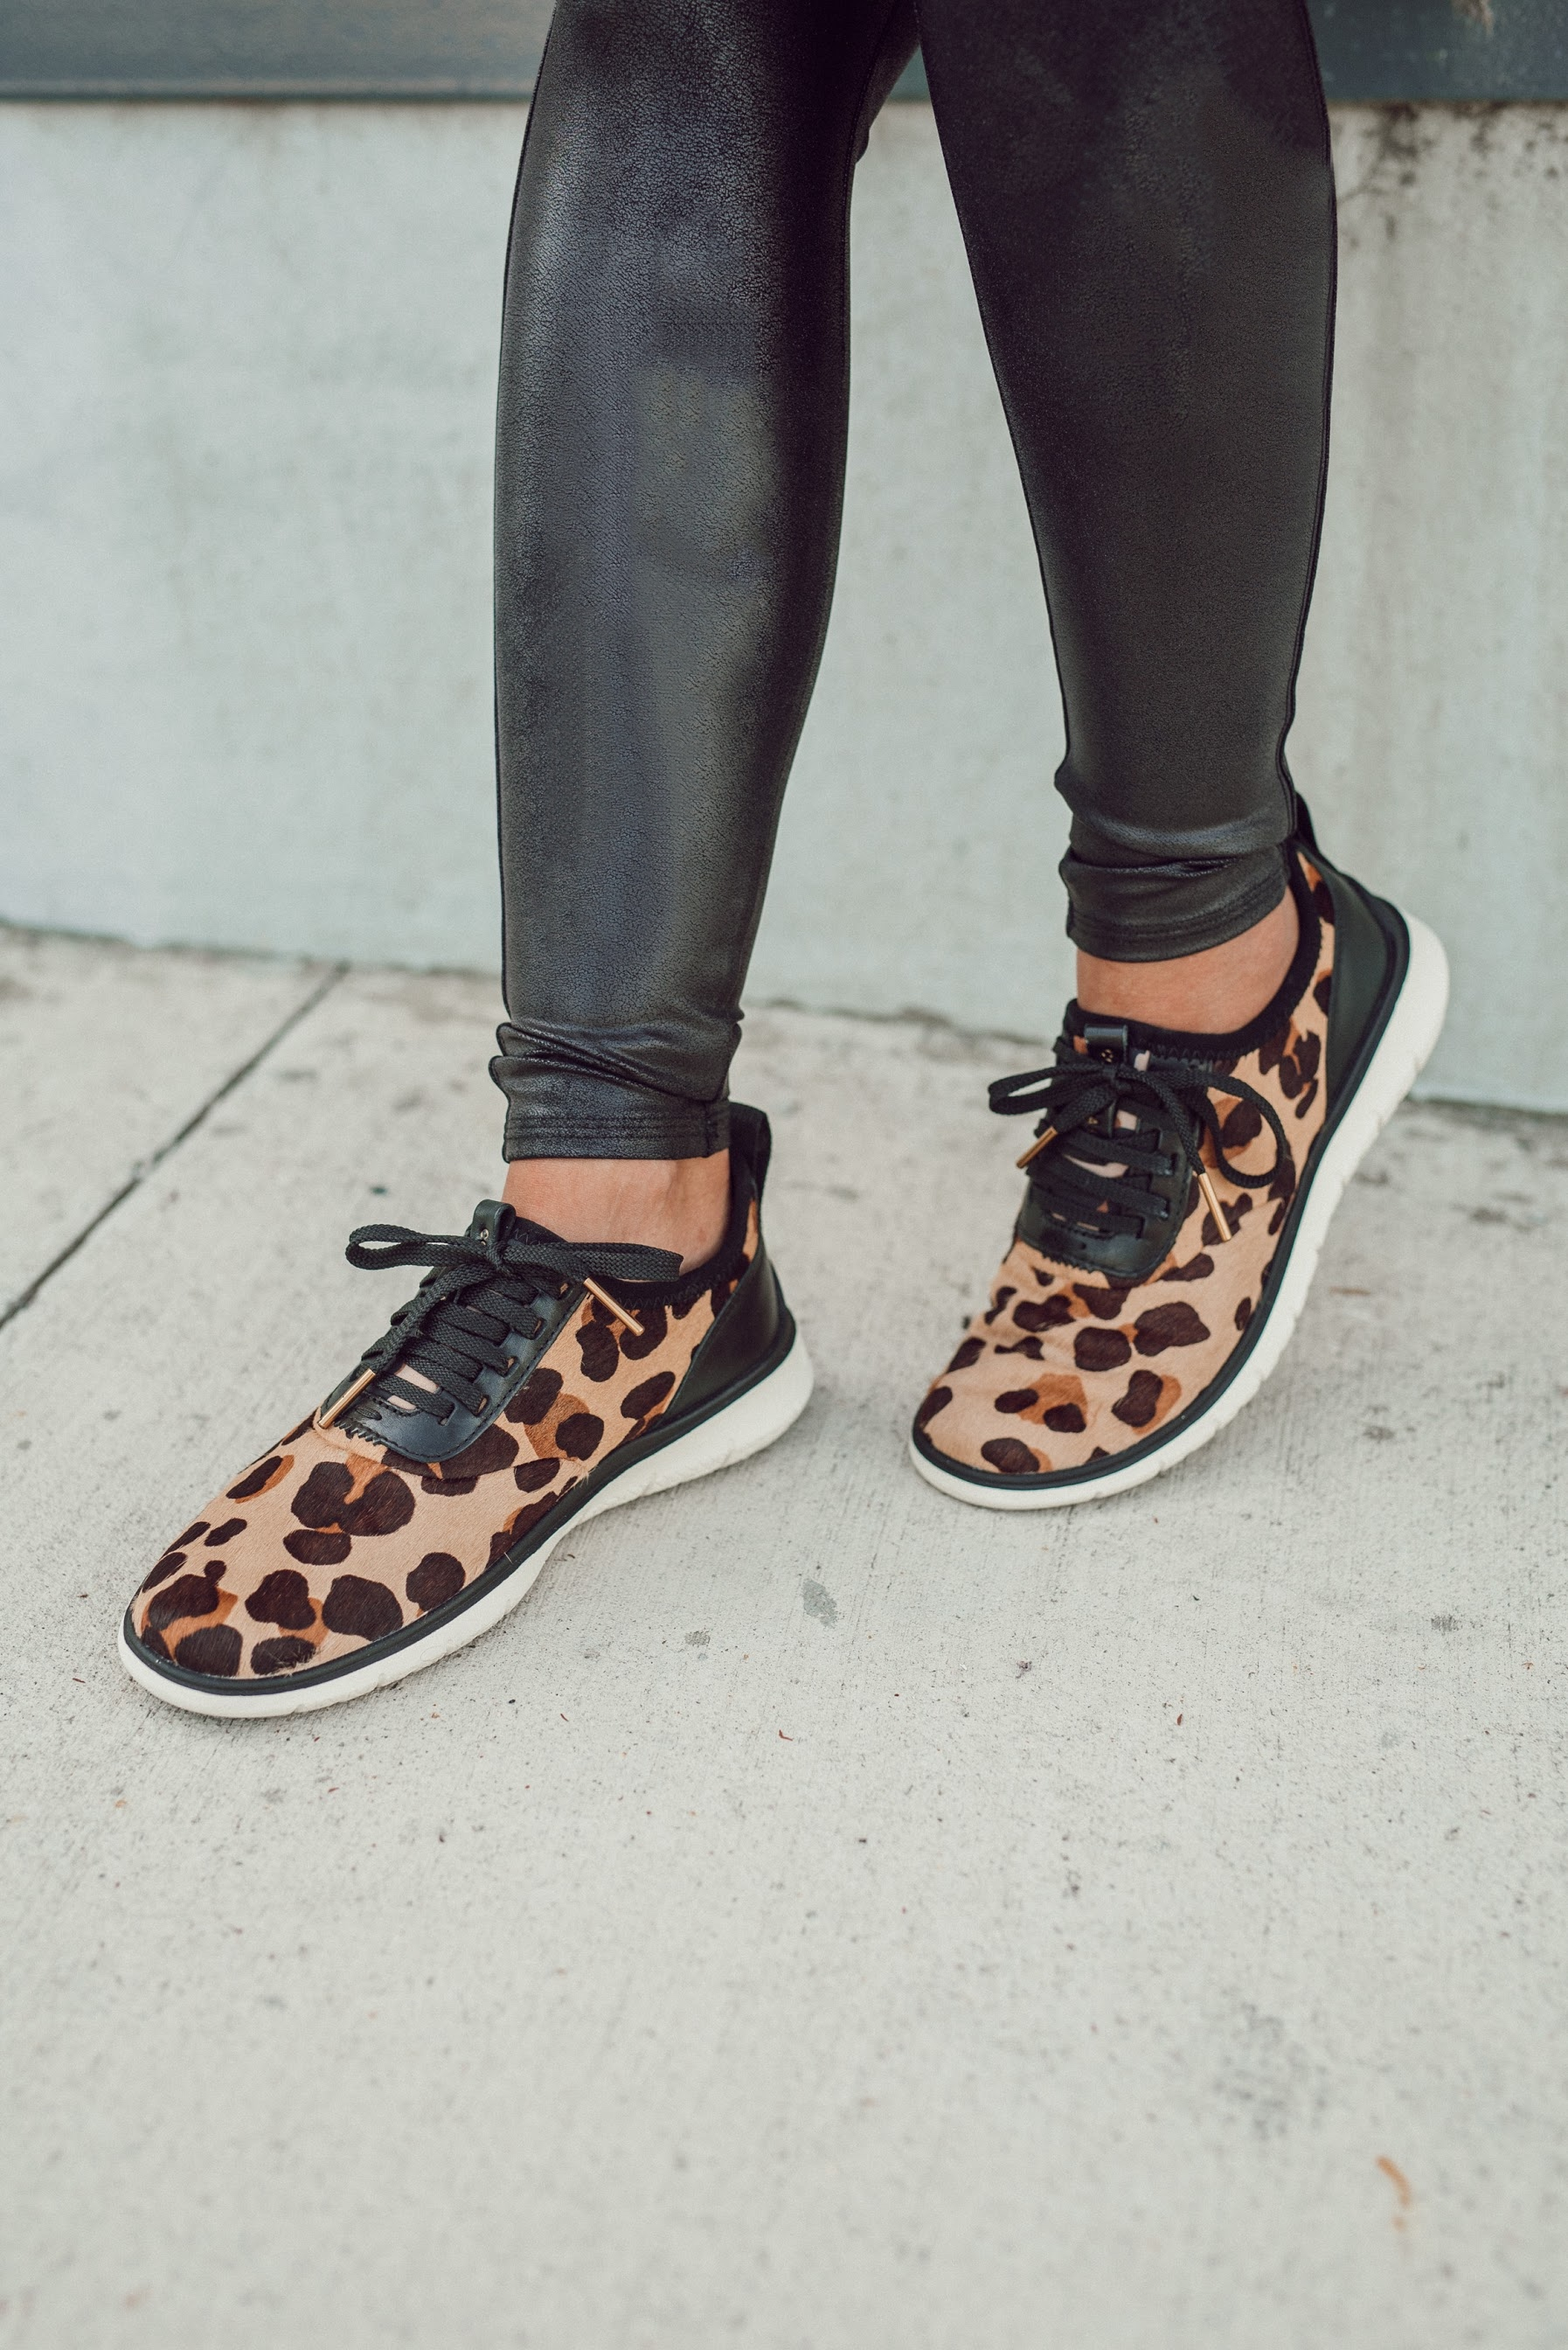 Cole Haan Leopard sneakers.JPEG